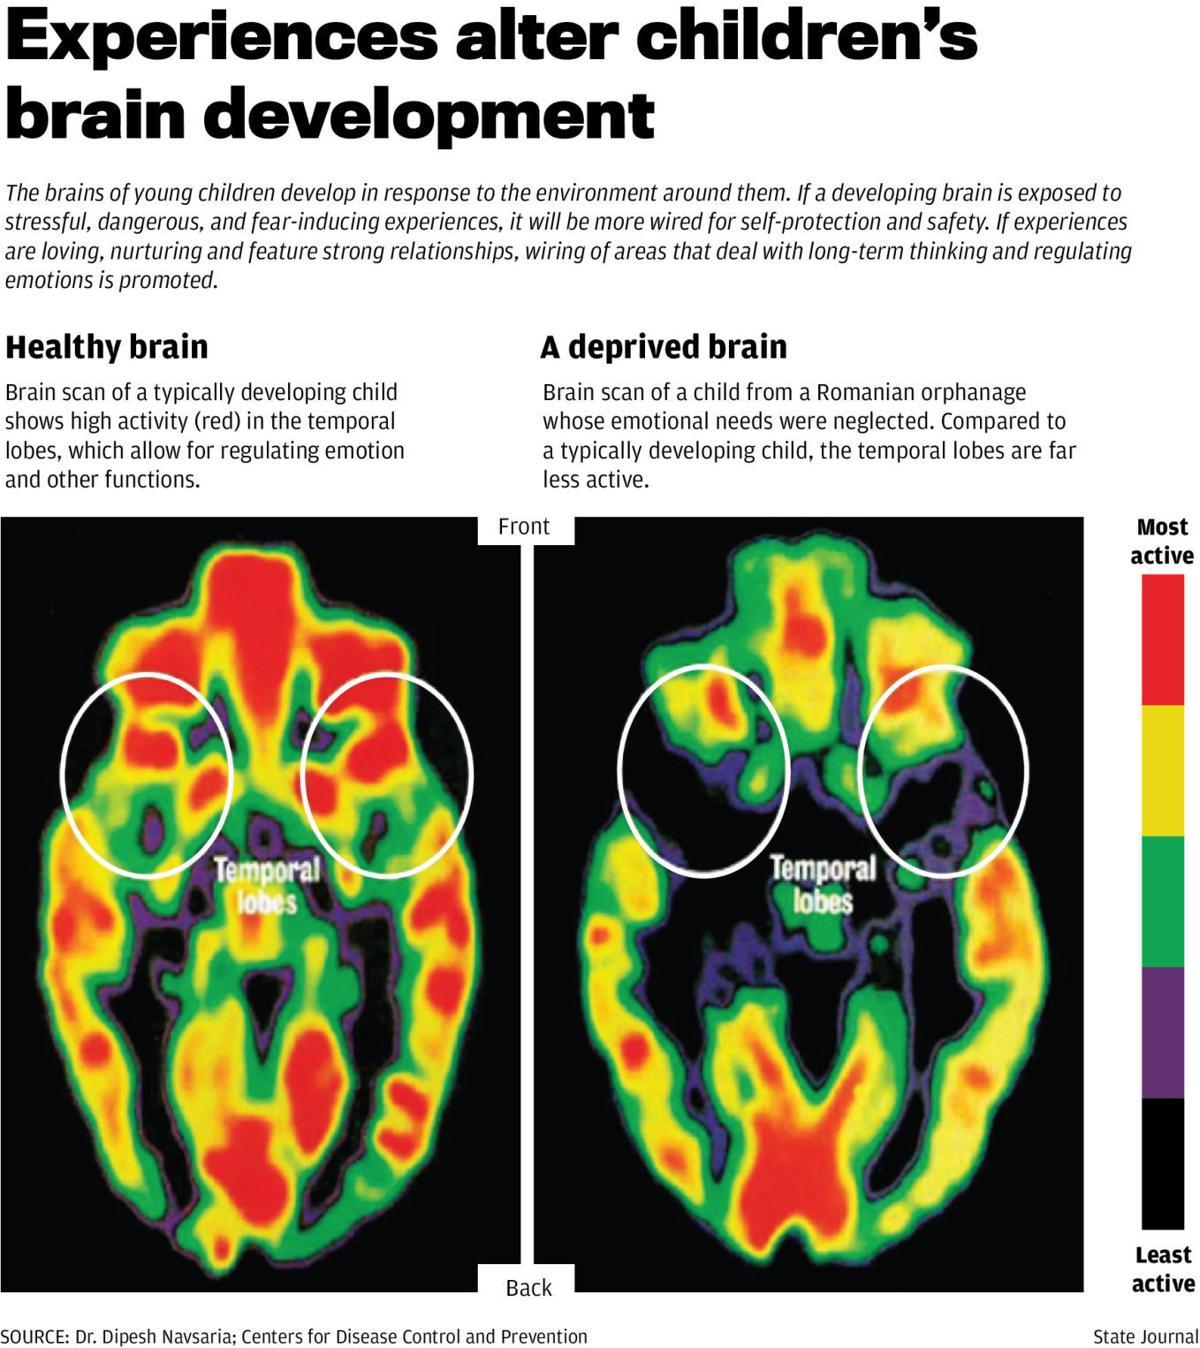 Experiences alter children's brain development